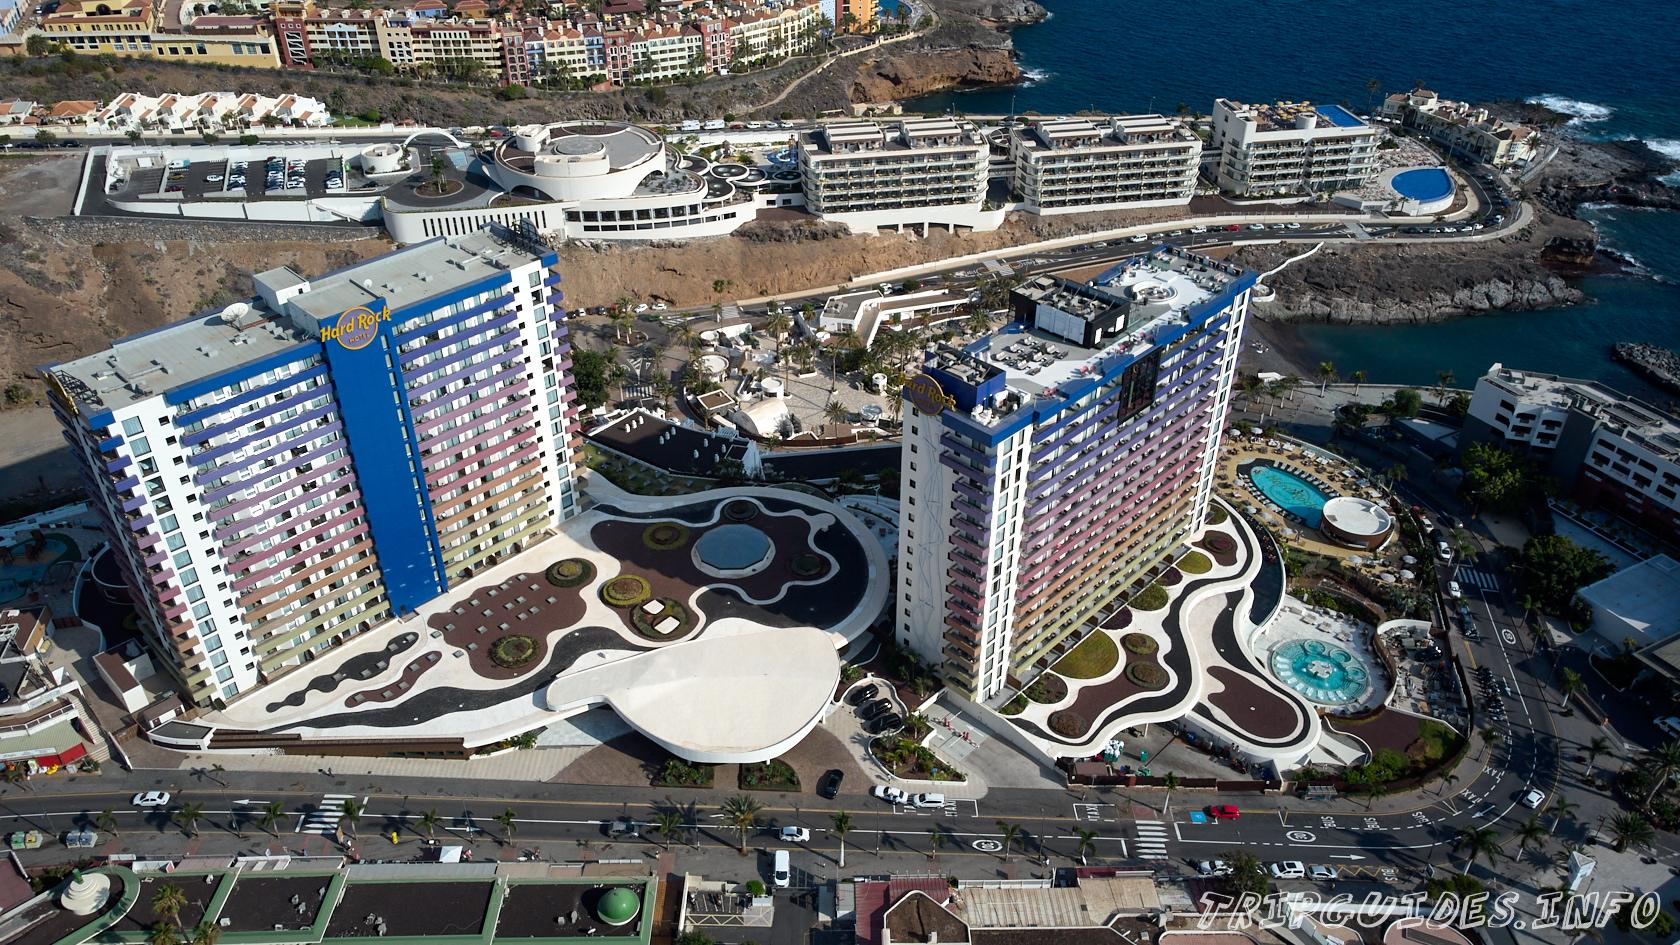 Отель Hard Rock Hotel Tenerife 5* в Плайя Параисо - курорт на Тенерифе